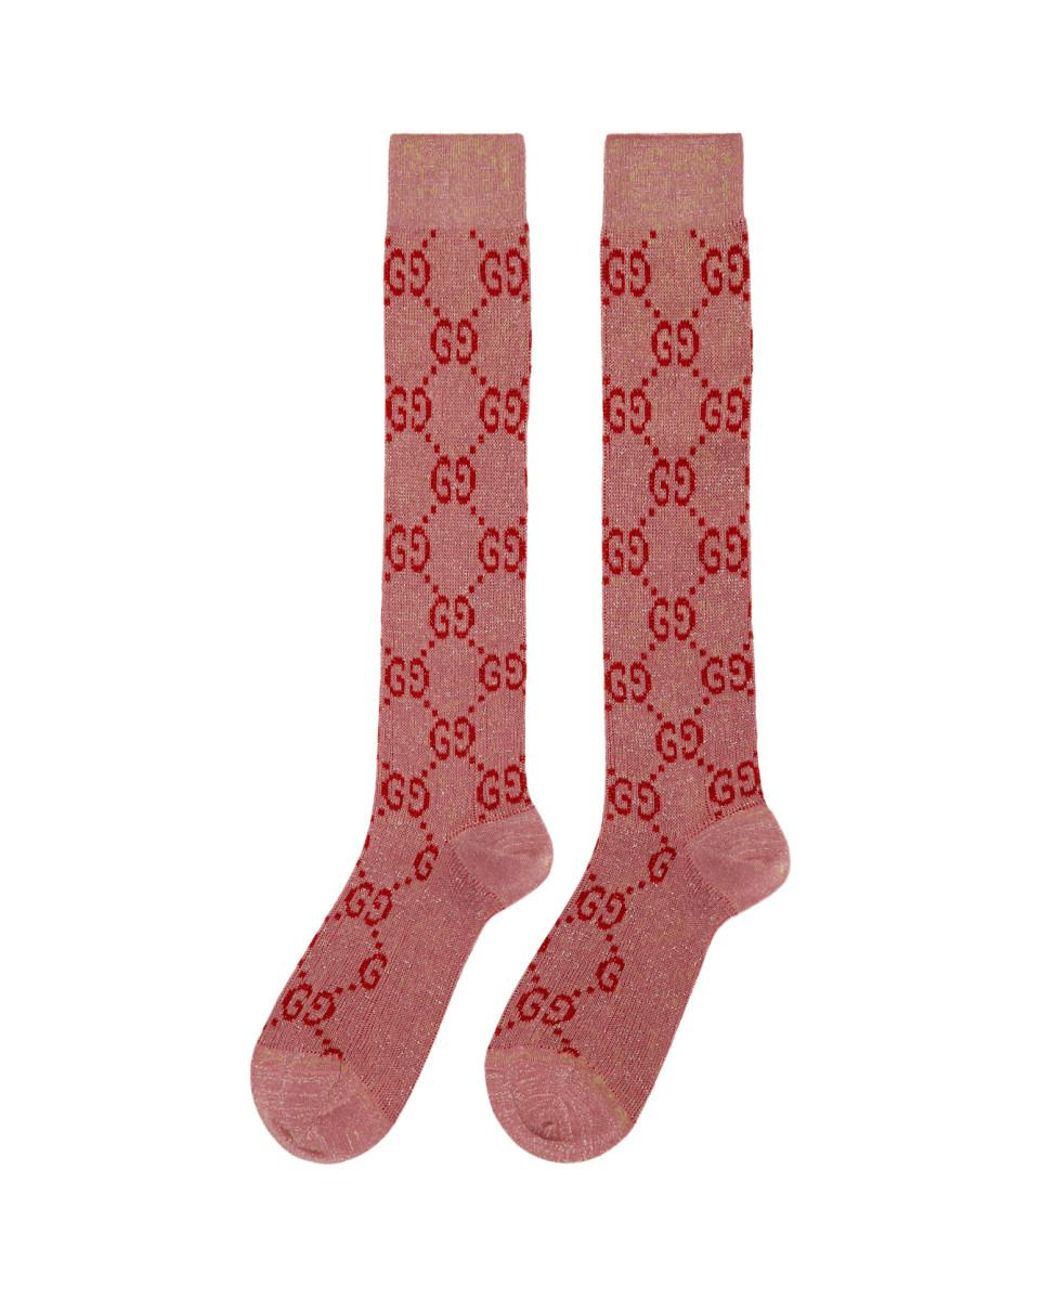 5cf1b958f Gucci Pink Crystal GG Socks in Pink - Lyst